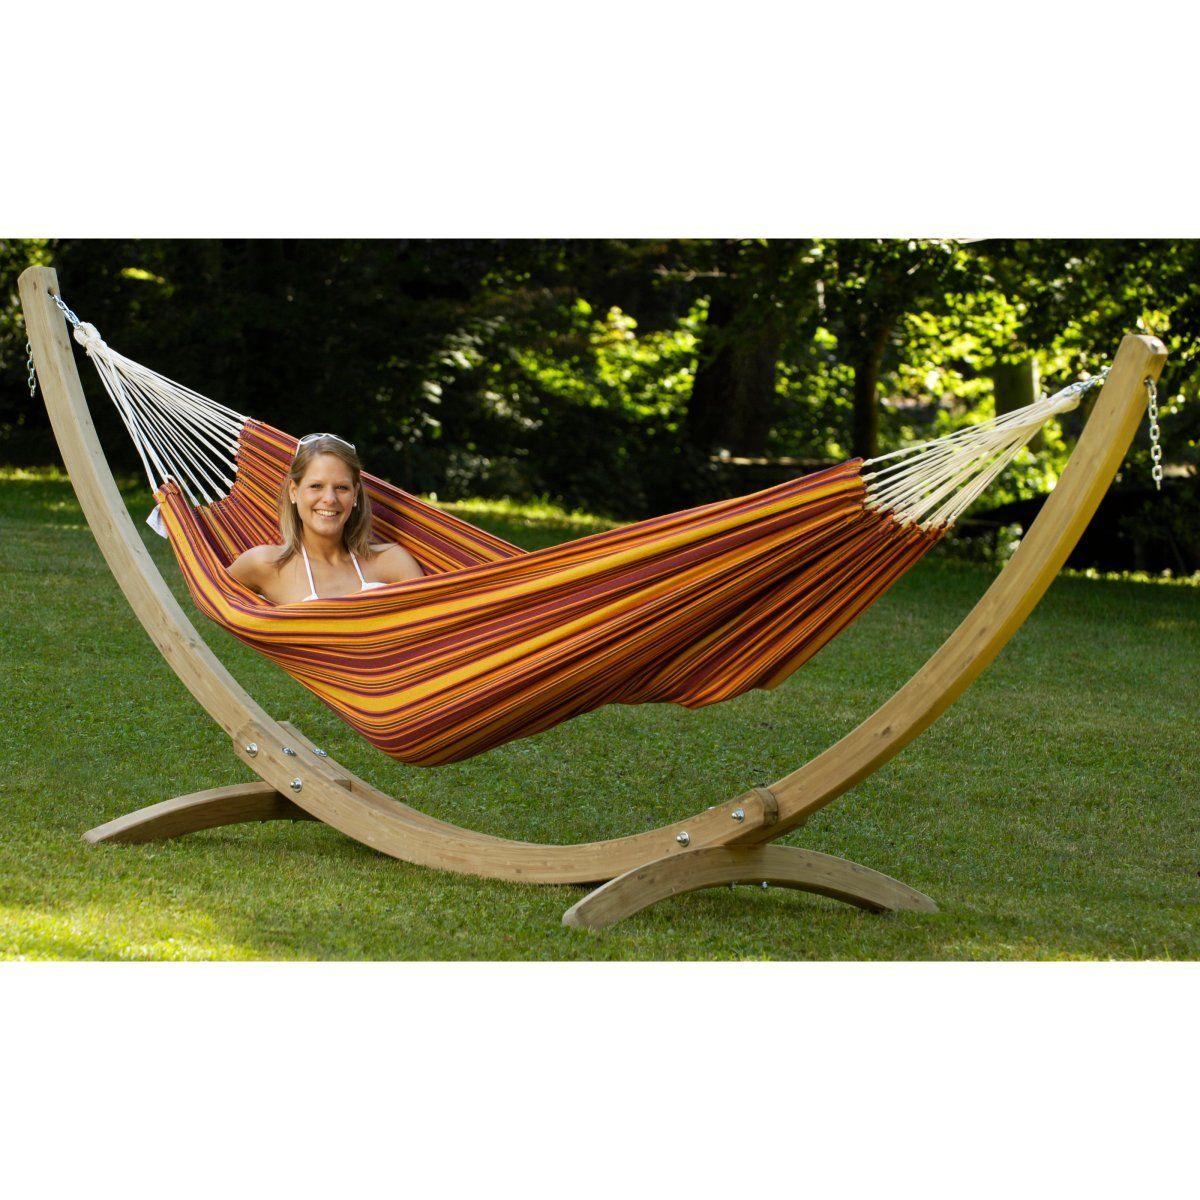 byer of maine olymp wood hammock stand byer of maine olymp wood hammock stand   outdoor living      rh   pinterest